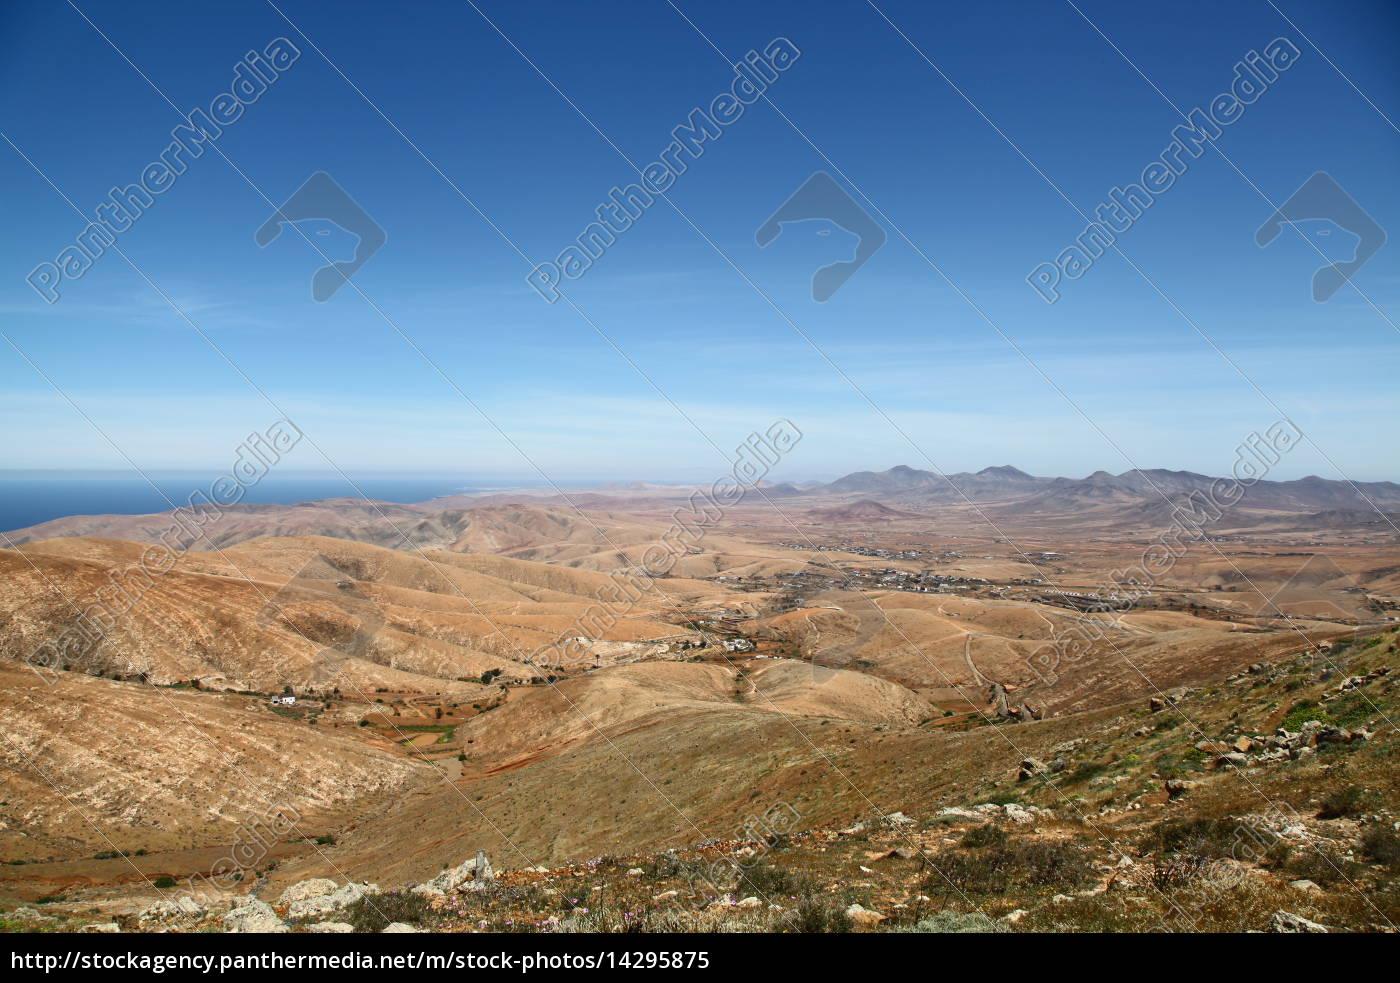 Fuerteventura, Kanarischen Inseln, Kanaren, Natur, Berge, Hügel - 14295875